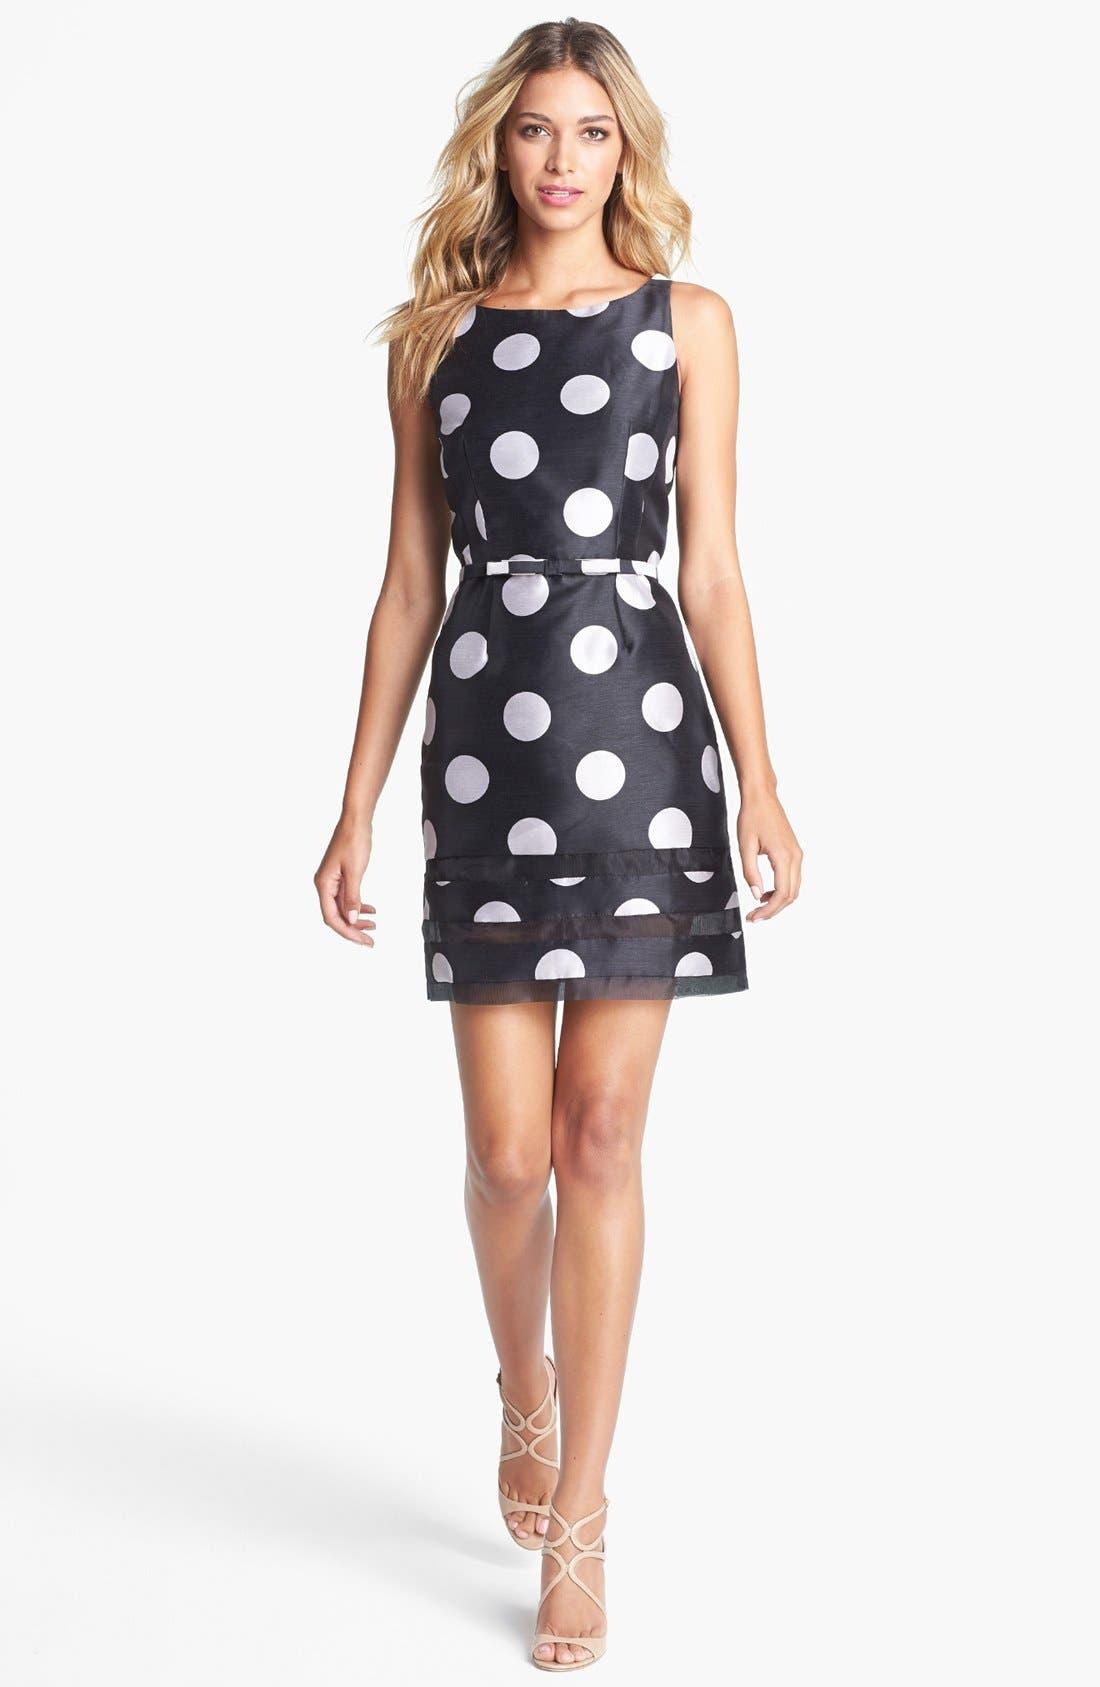 Alternate Image 1 Selected - Taylor Dresses Polka Dot Sheath Dress